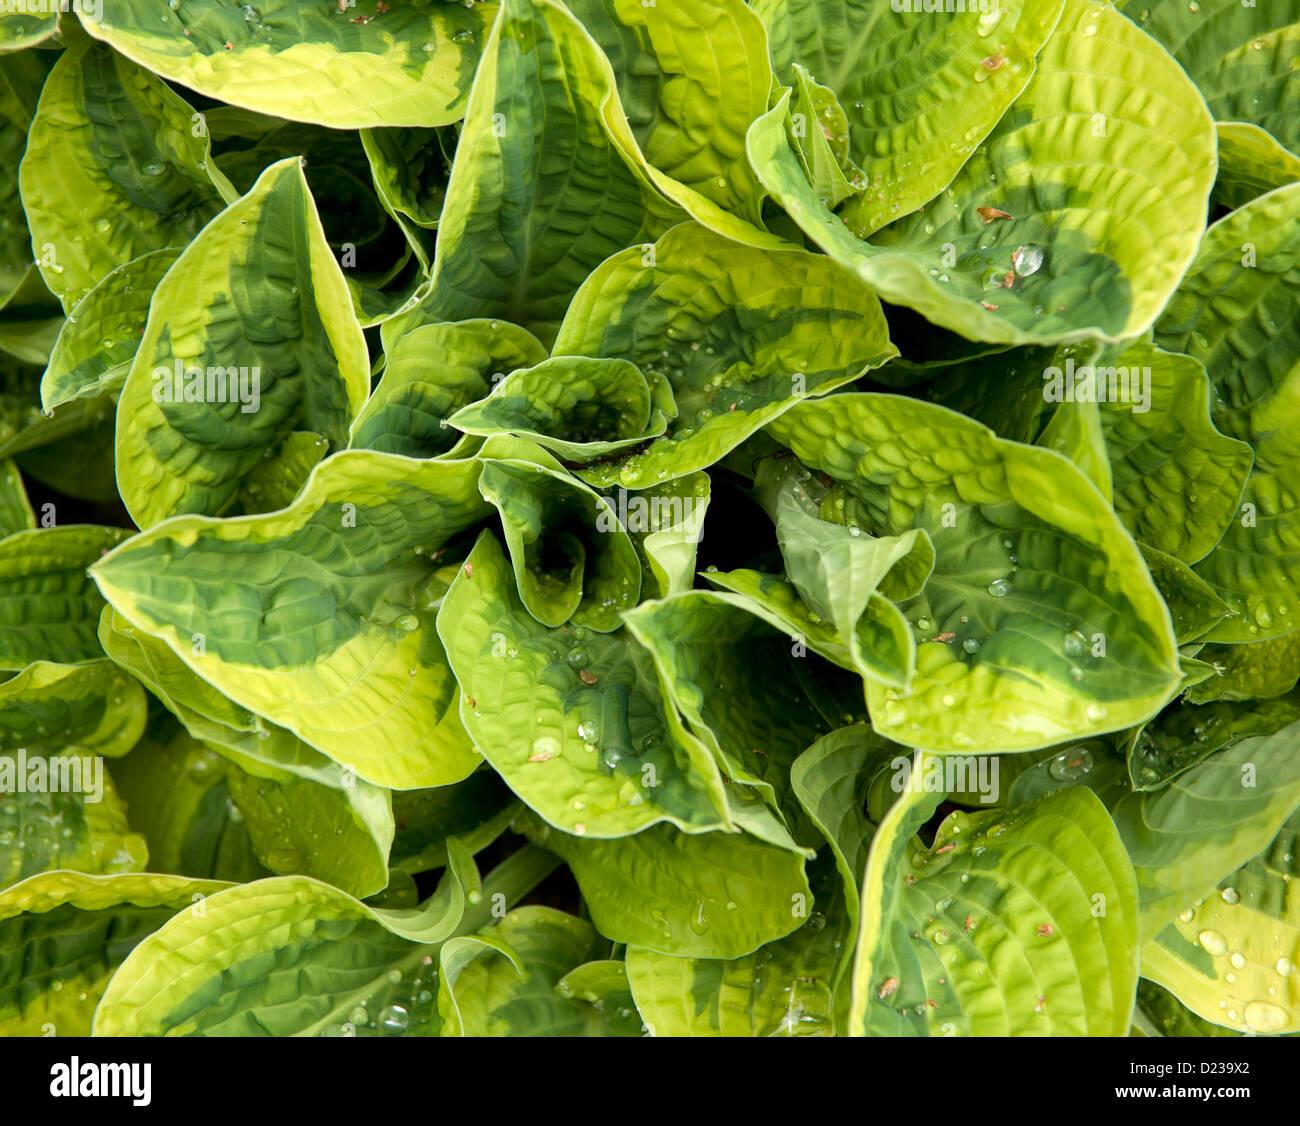 variegated foliage photos variegated foliage images alamy. Black Bedroom Furniture Sets. Home Design Ideas